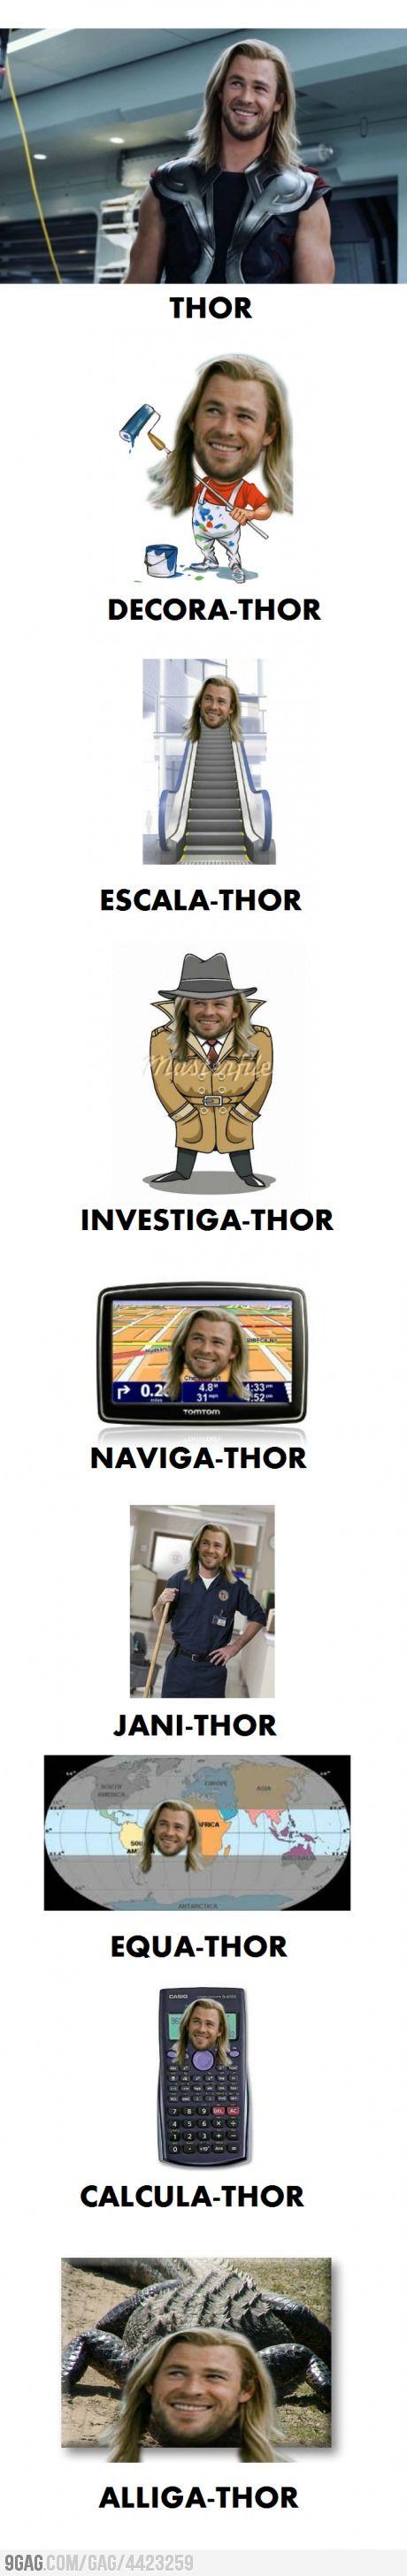 : Geek, Avengers, Giggl, Funny Stuff, Thor Thor, Humor, Thor Everywh, So Funny, Superhero